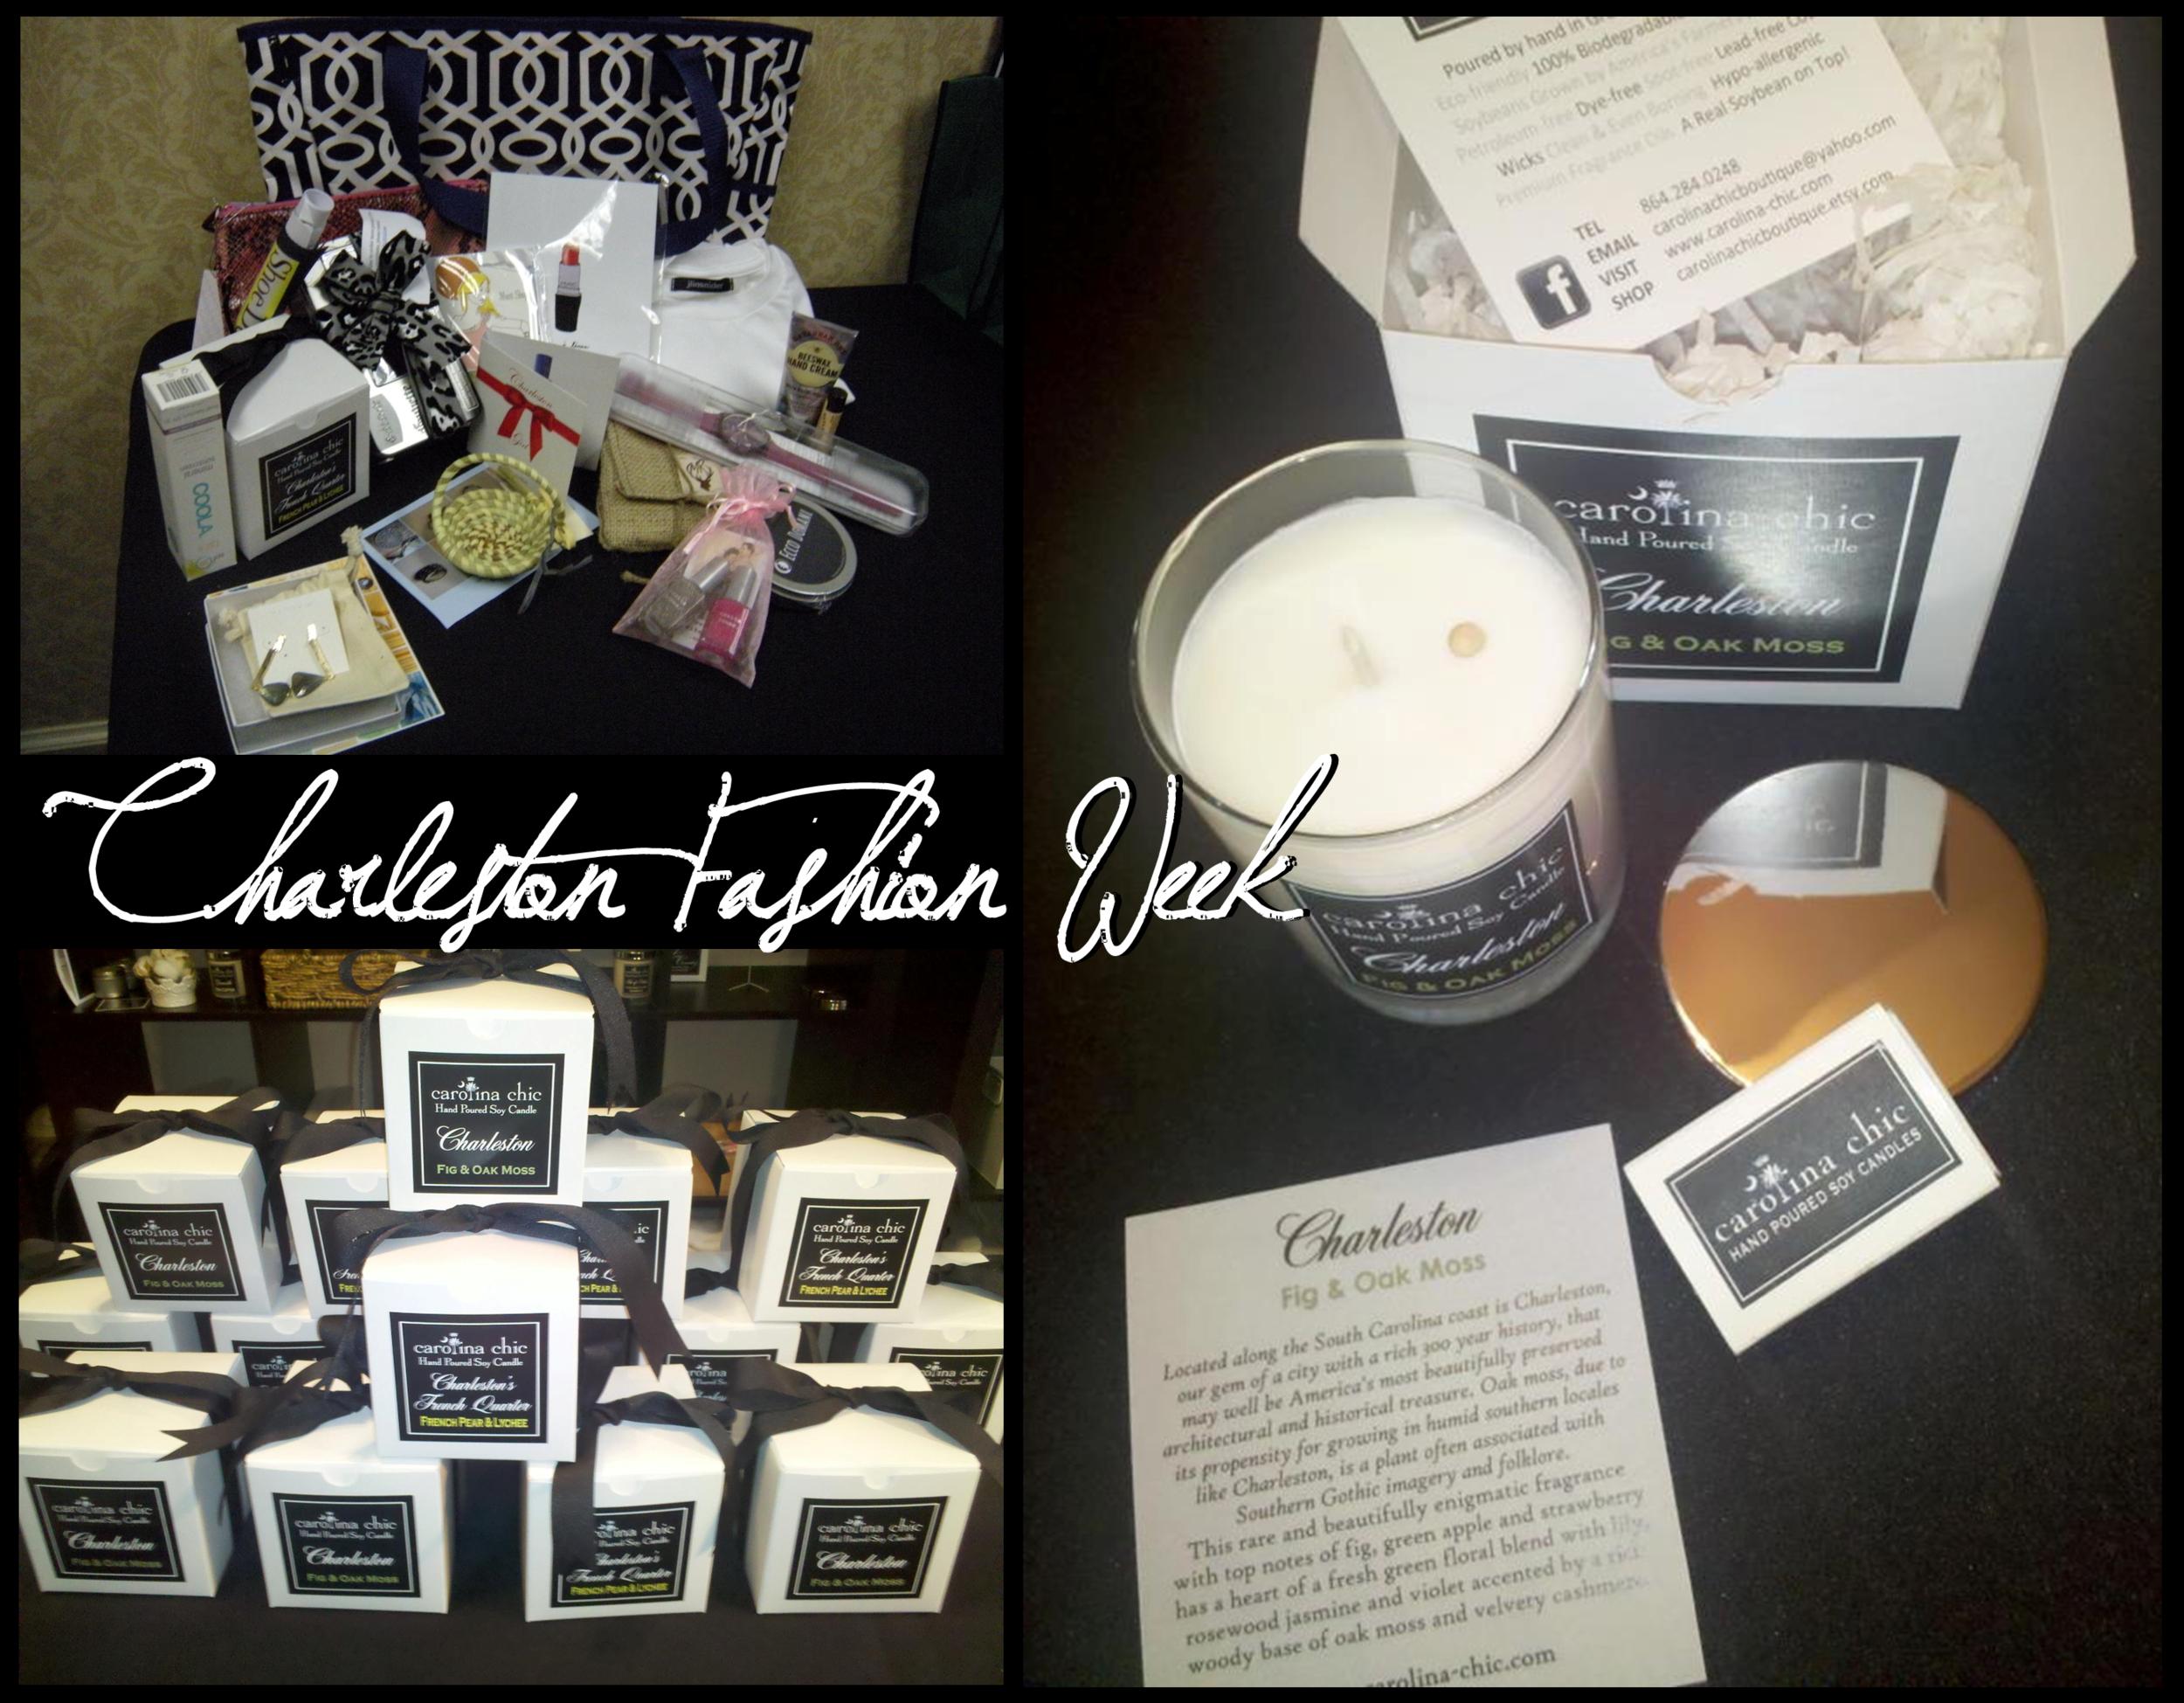 Charleston Fashion Week / VIP Gifts